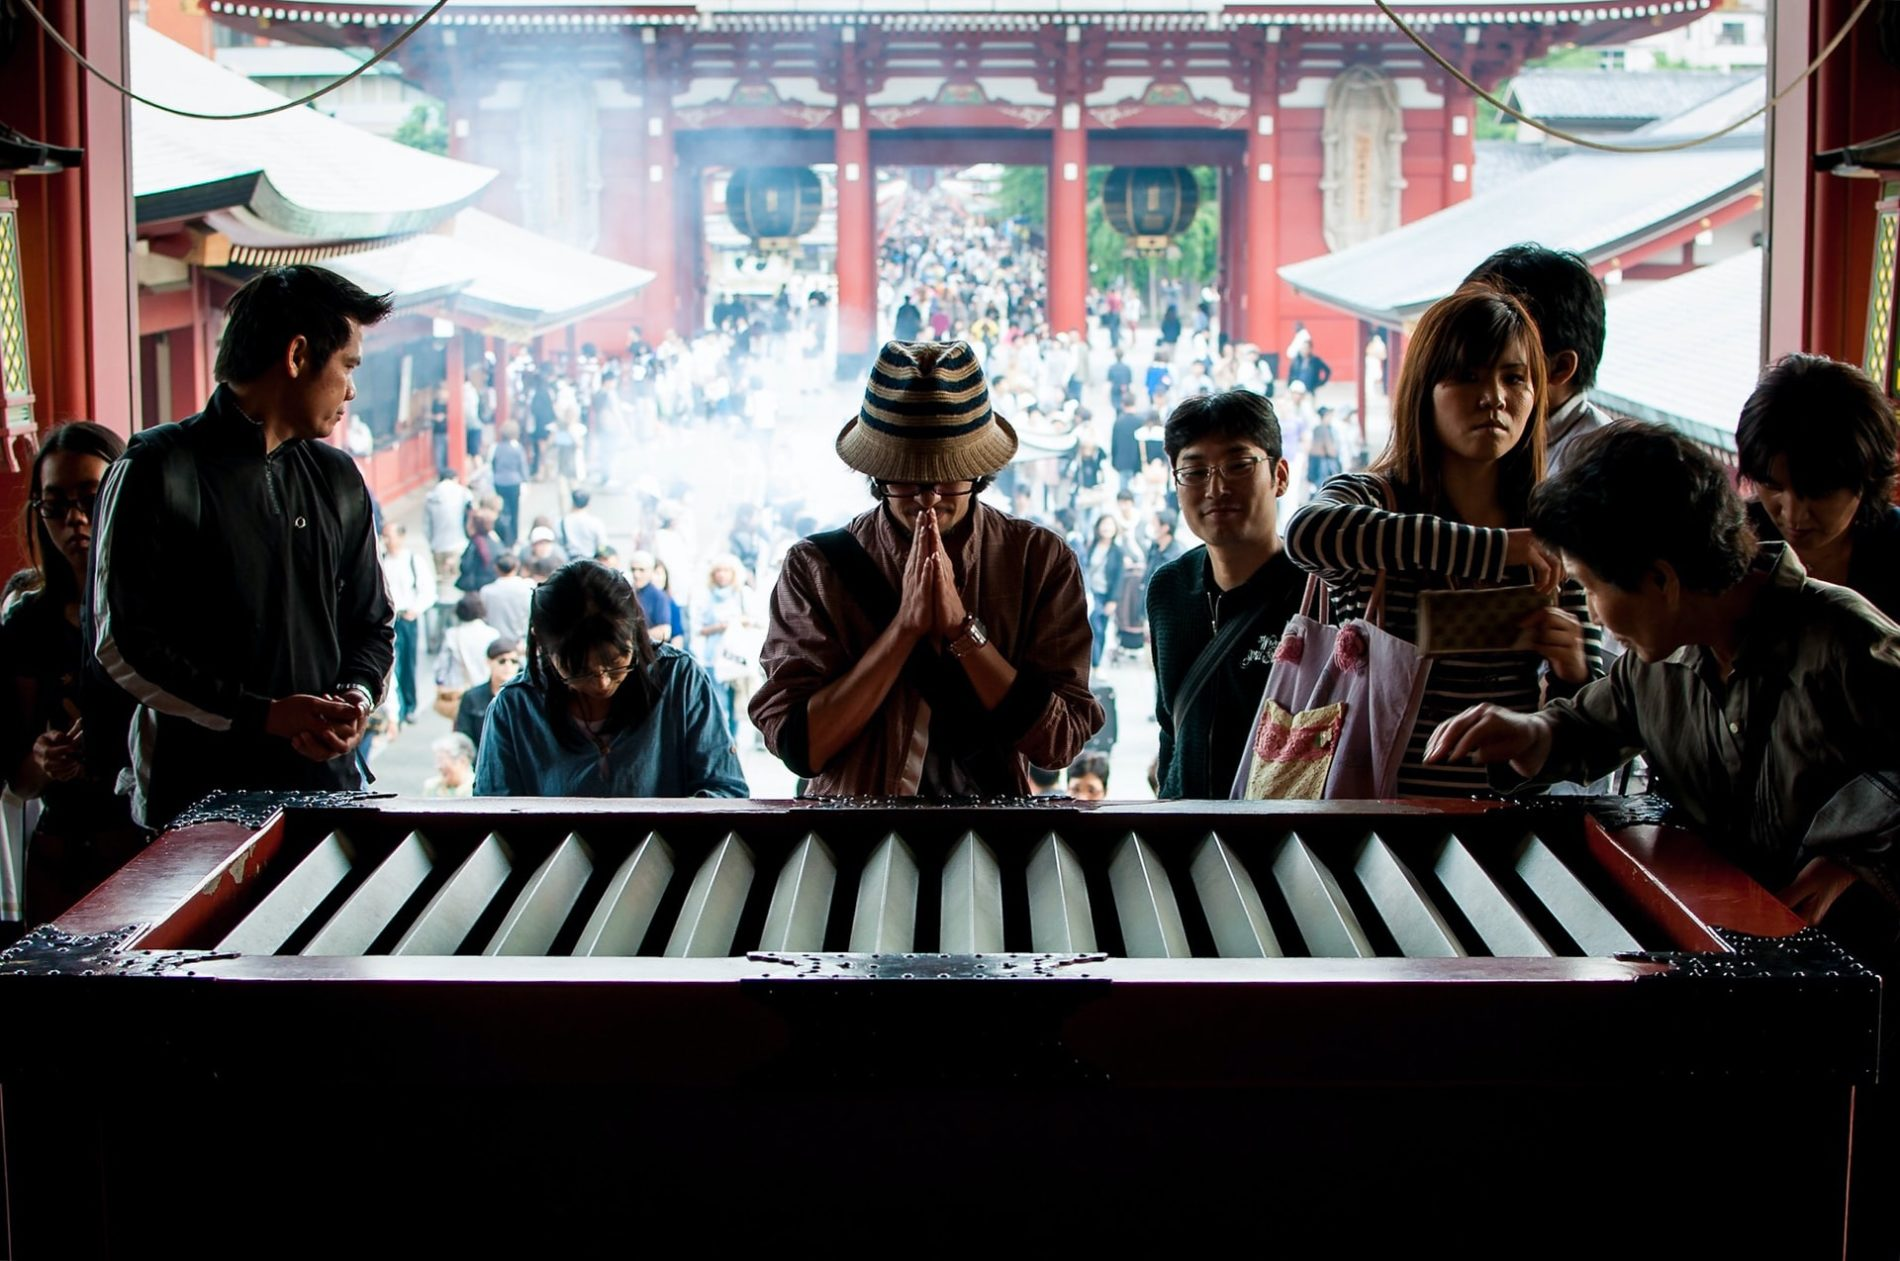 Vermutlich Japans meistfotografierte saisenbako Spendenbox am Senso-ji Tempel in Asakusa, Tōkyō. (Foto: David Klein auf Unsplash https://unsplash.com/photos/L3Io-LfakAA)